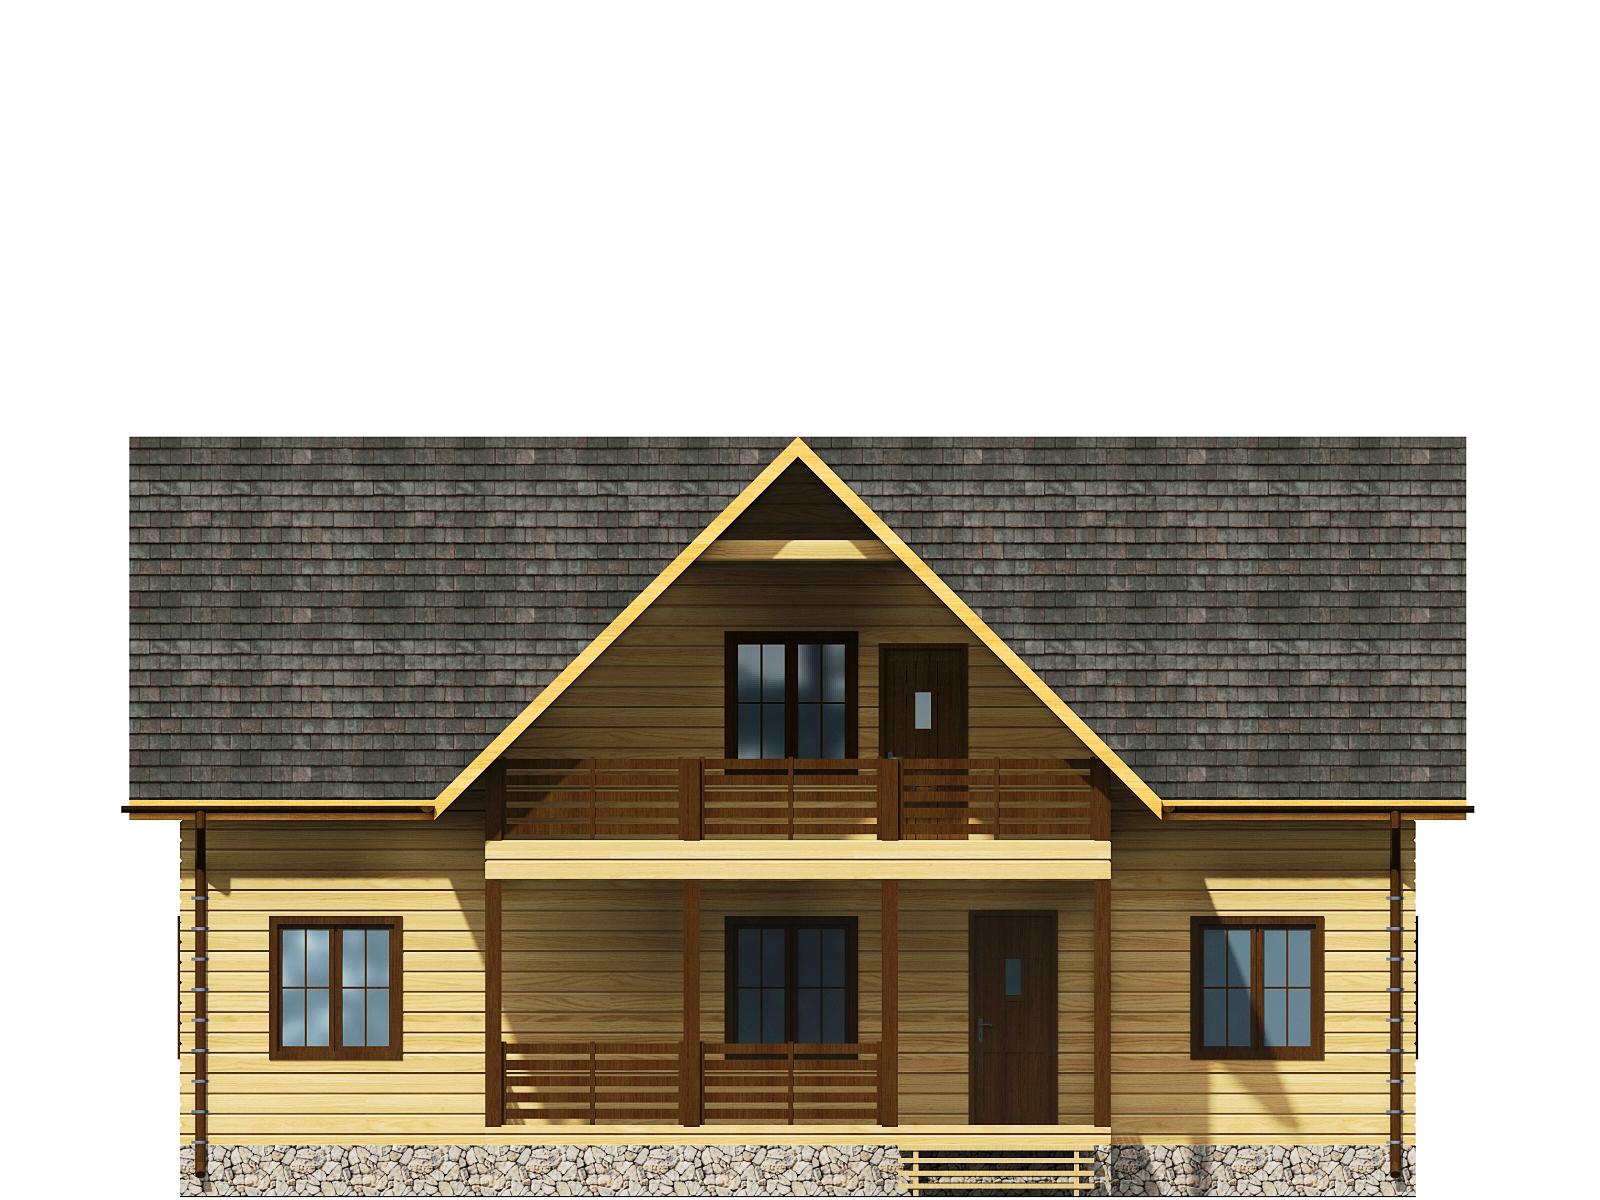 dom-iz-brusa-6x12-1.5-etazha-s-mansardoi-razrez1